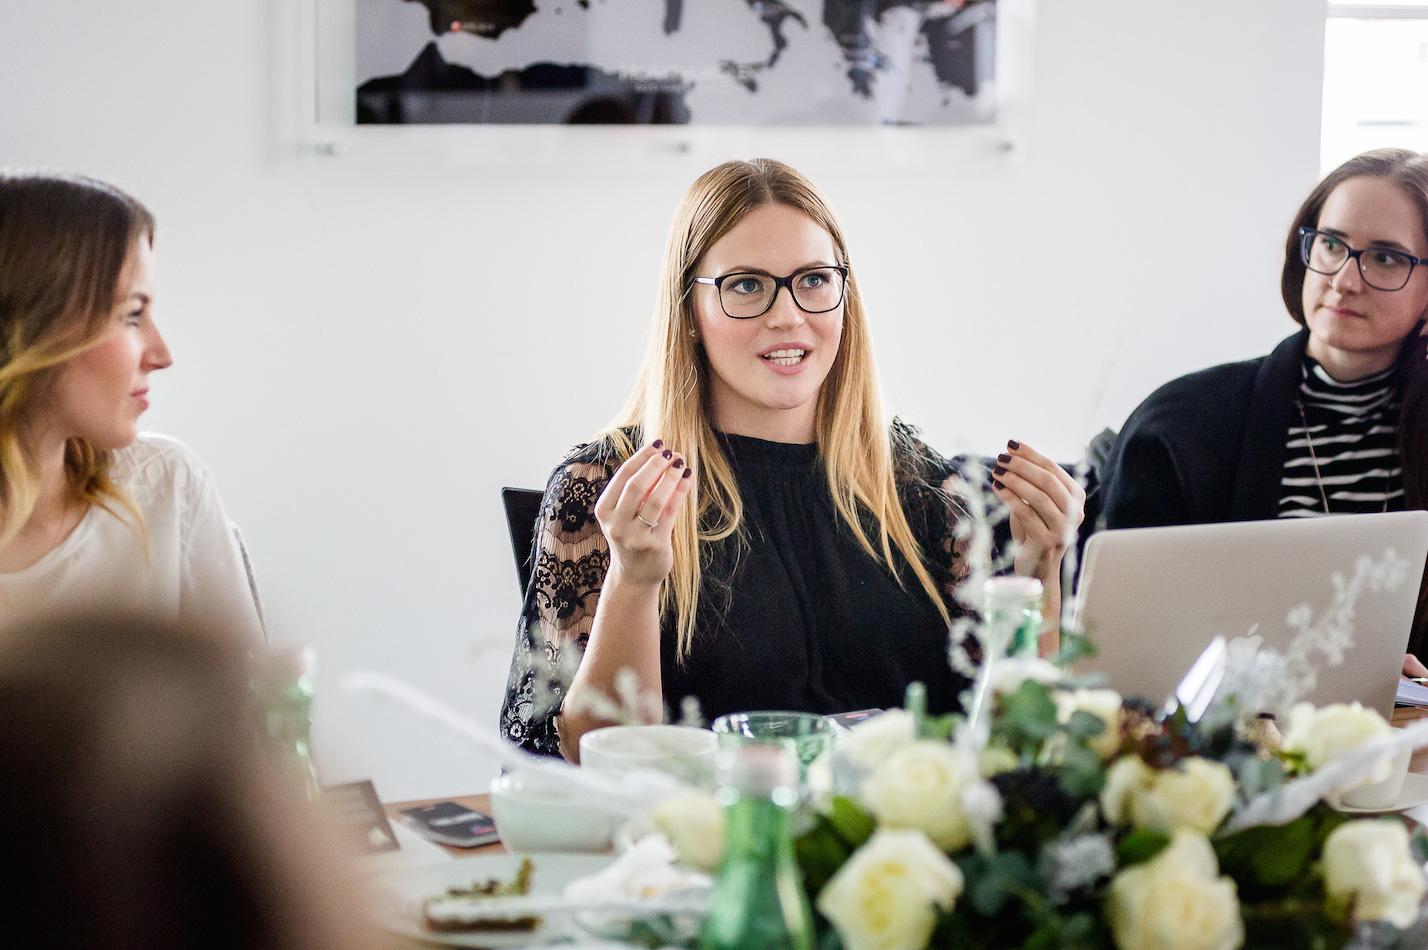 #MGBloggerClass - McArthurGlen Designer Outlets | Love Daily Dose